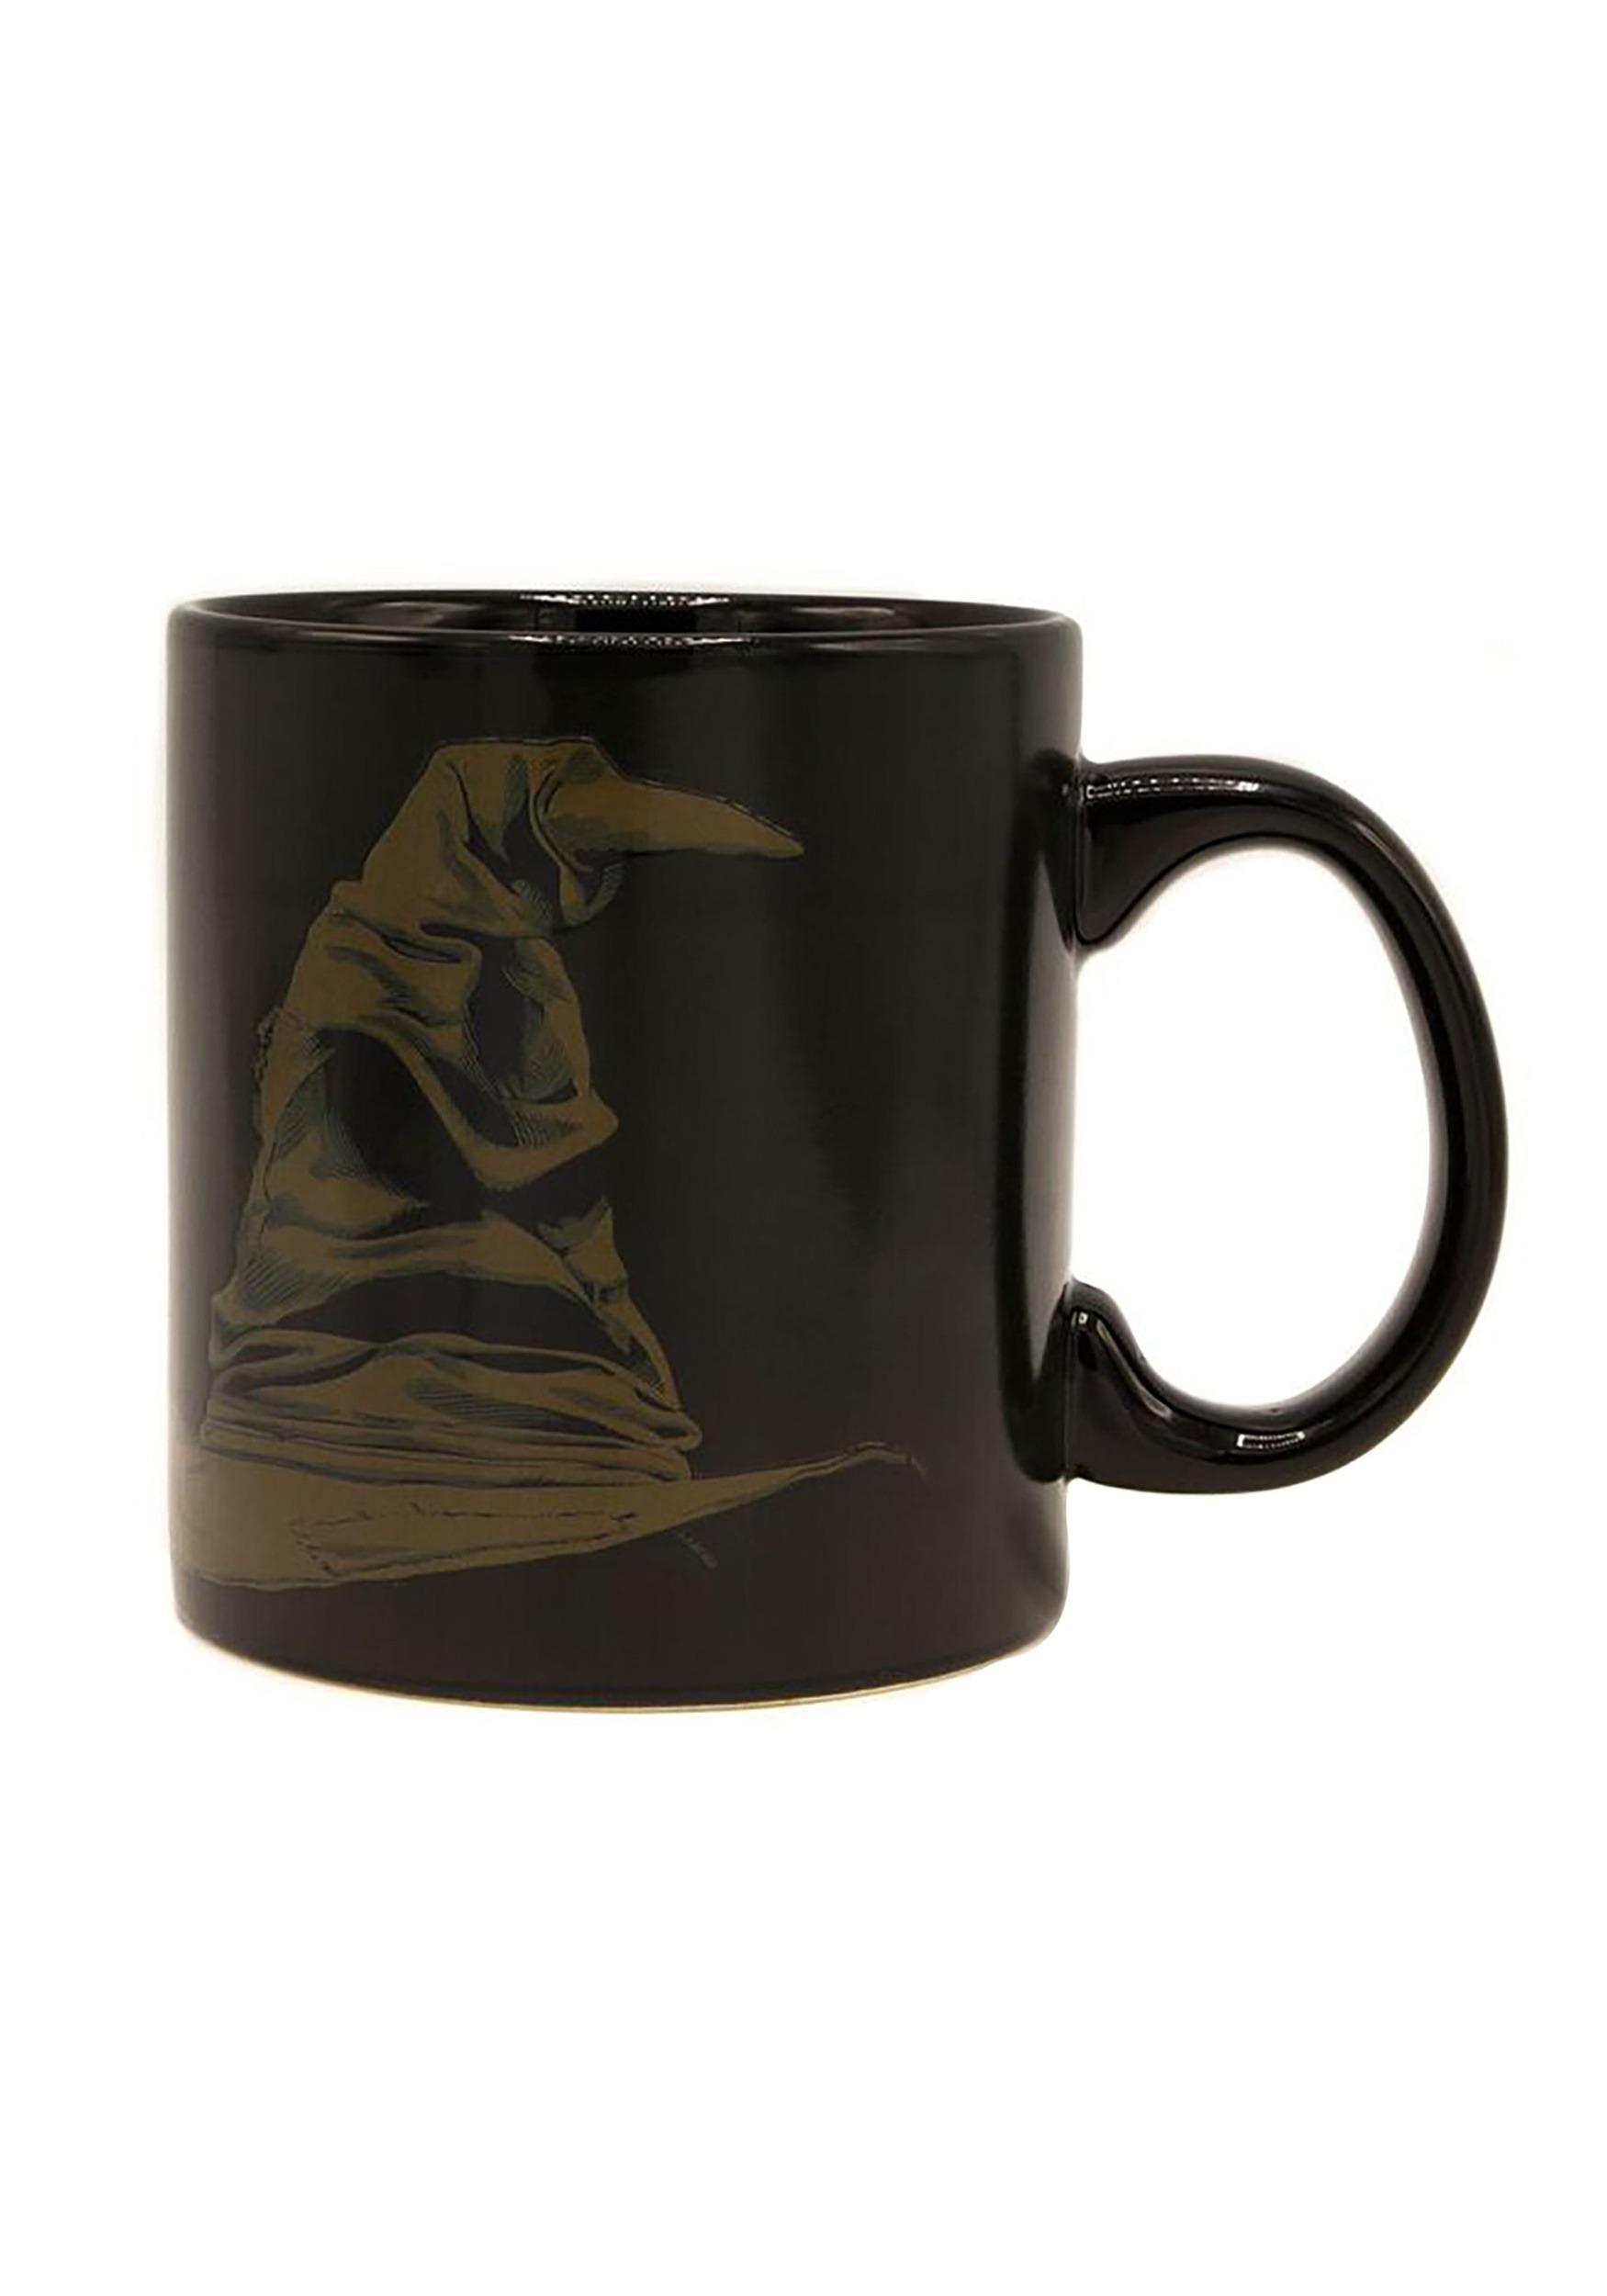 hogwarts gryffindor heat reveal sorting hat mug